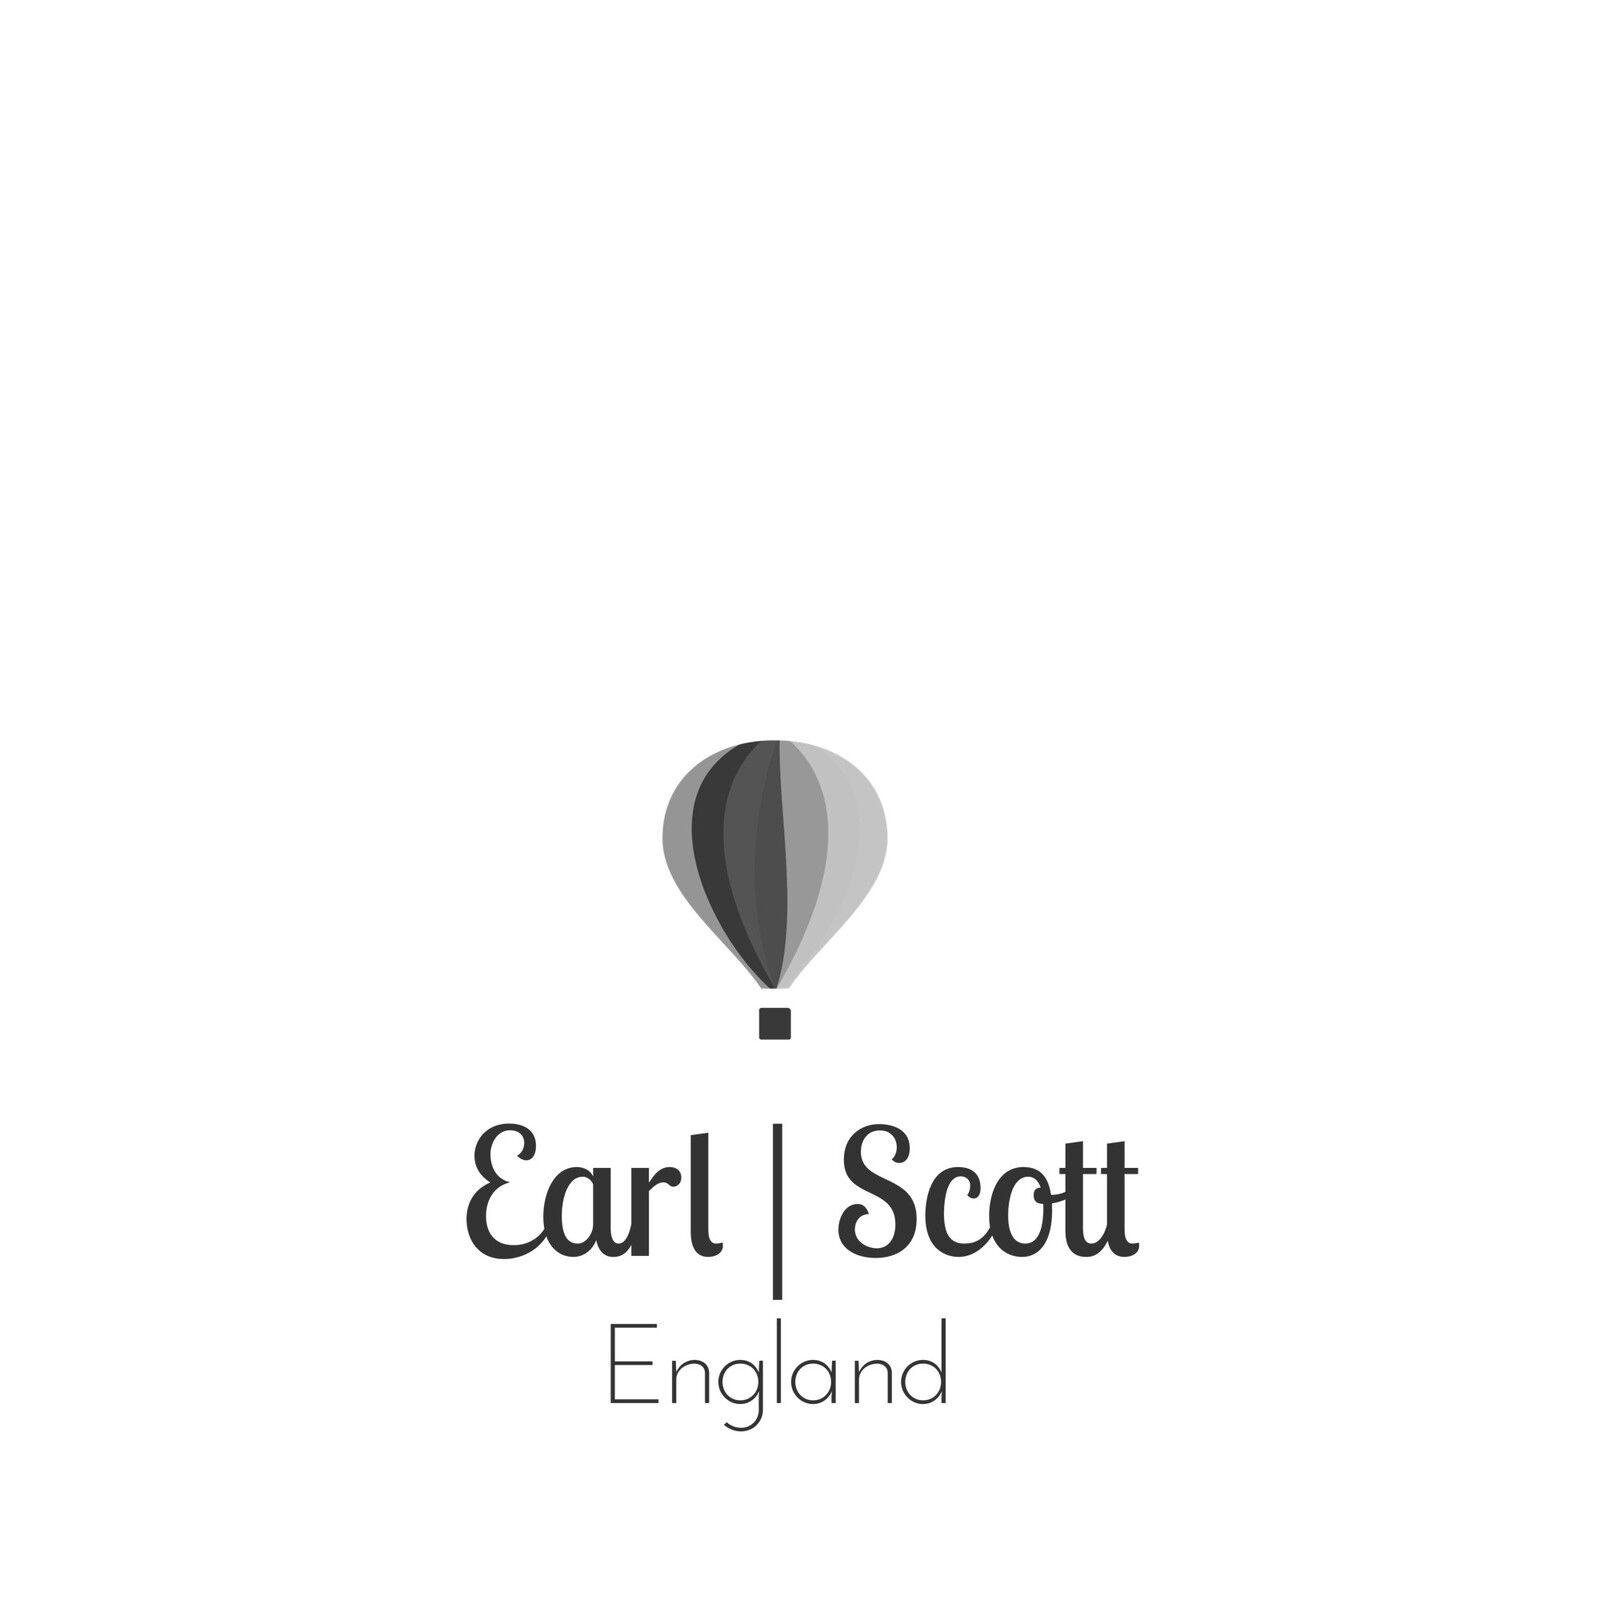 Earl and Scott